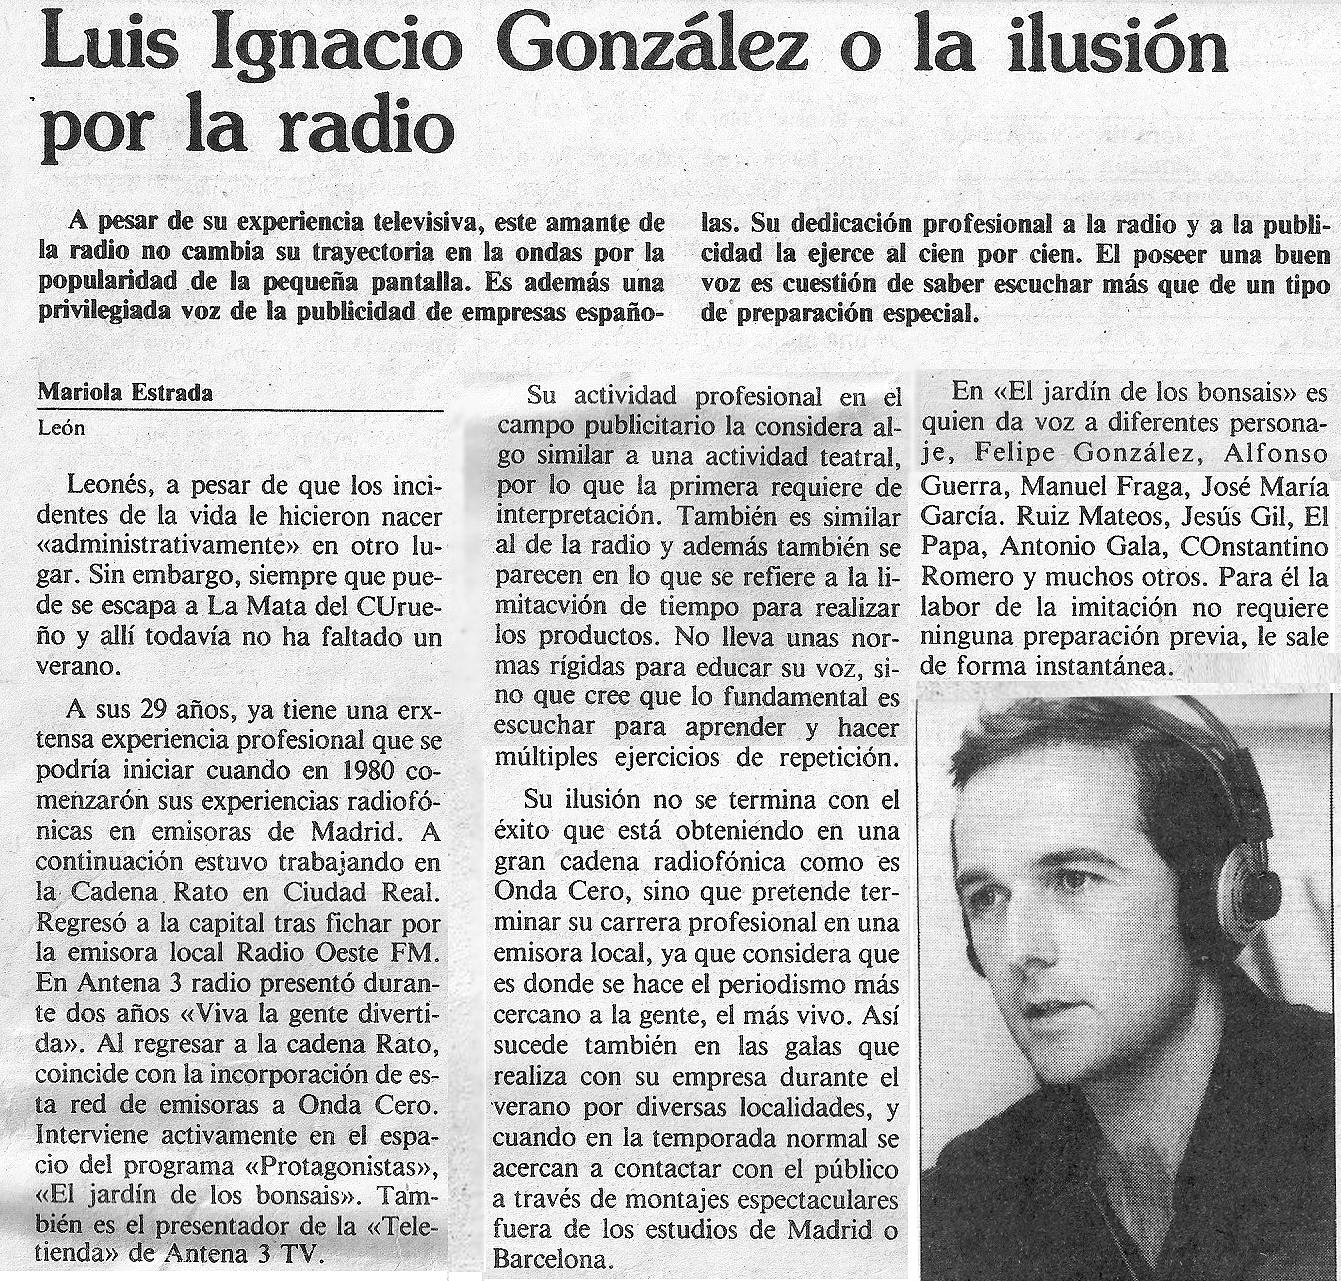 Luis Ignacio González